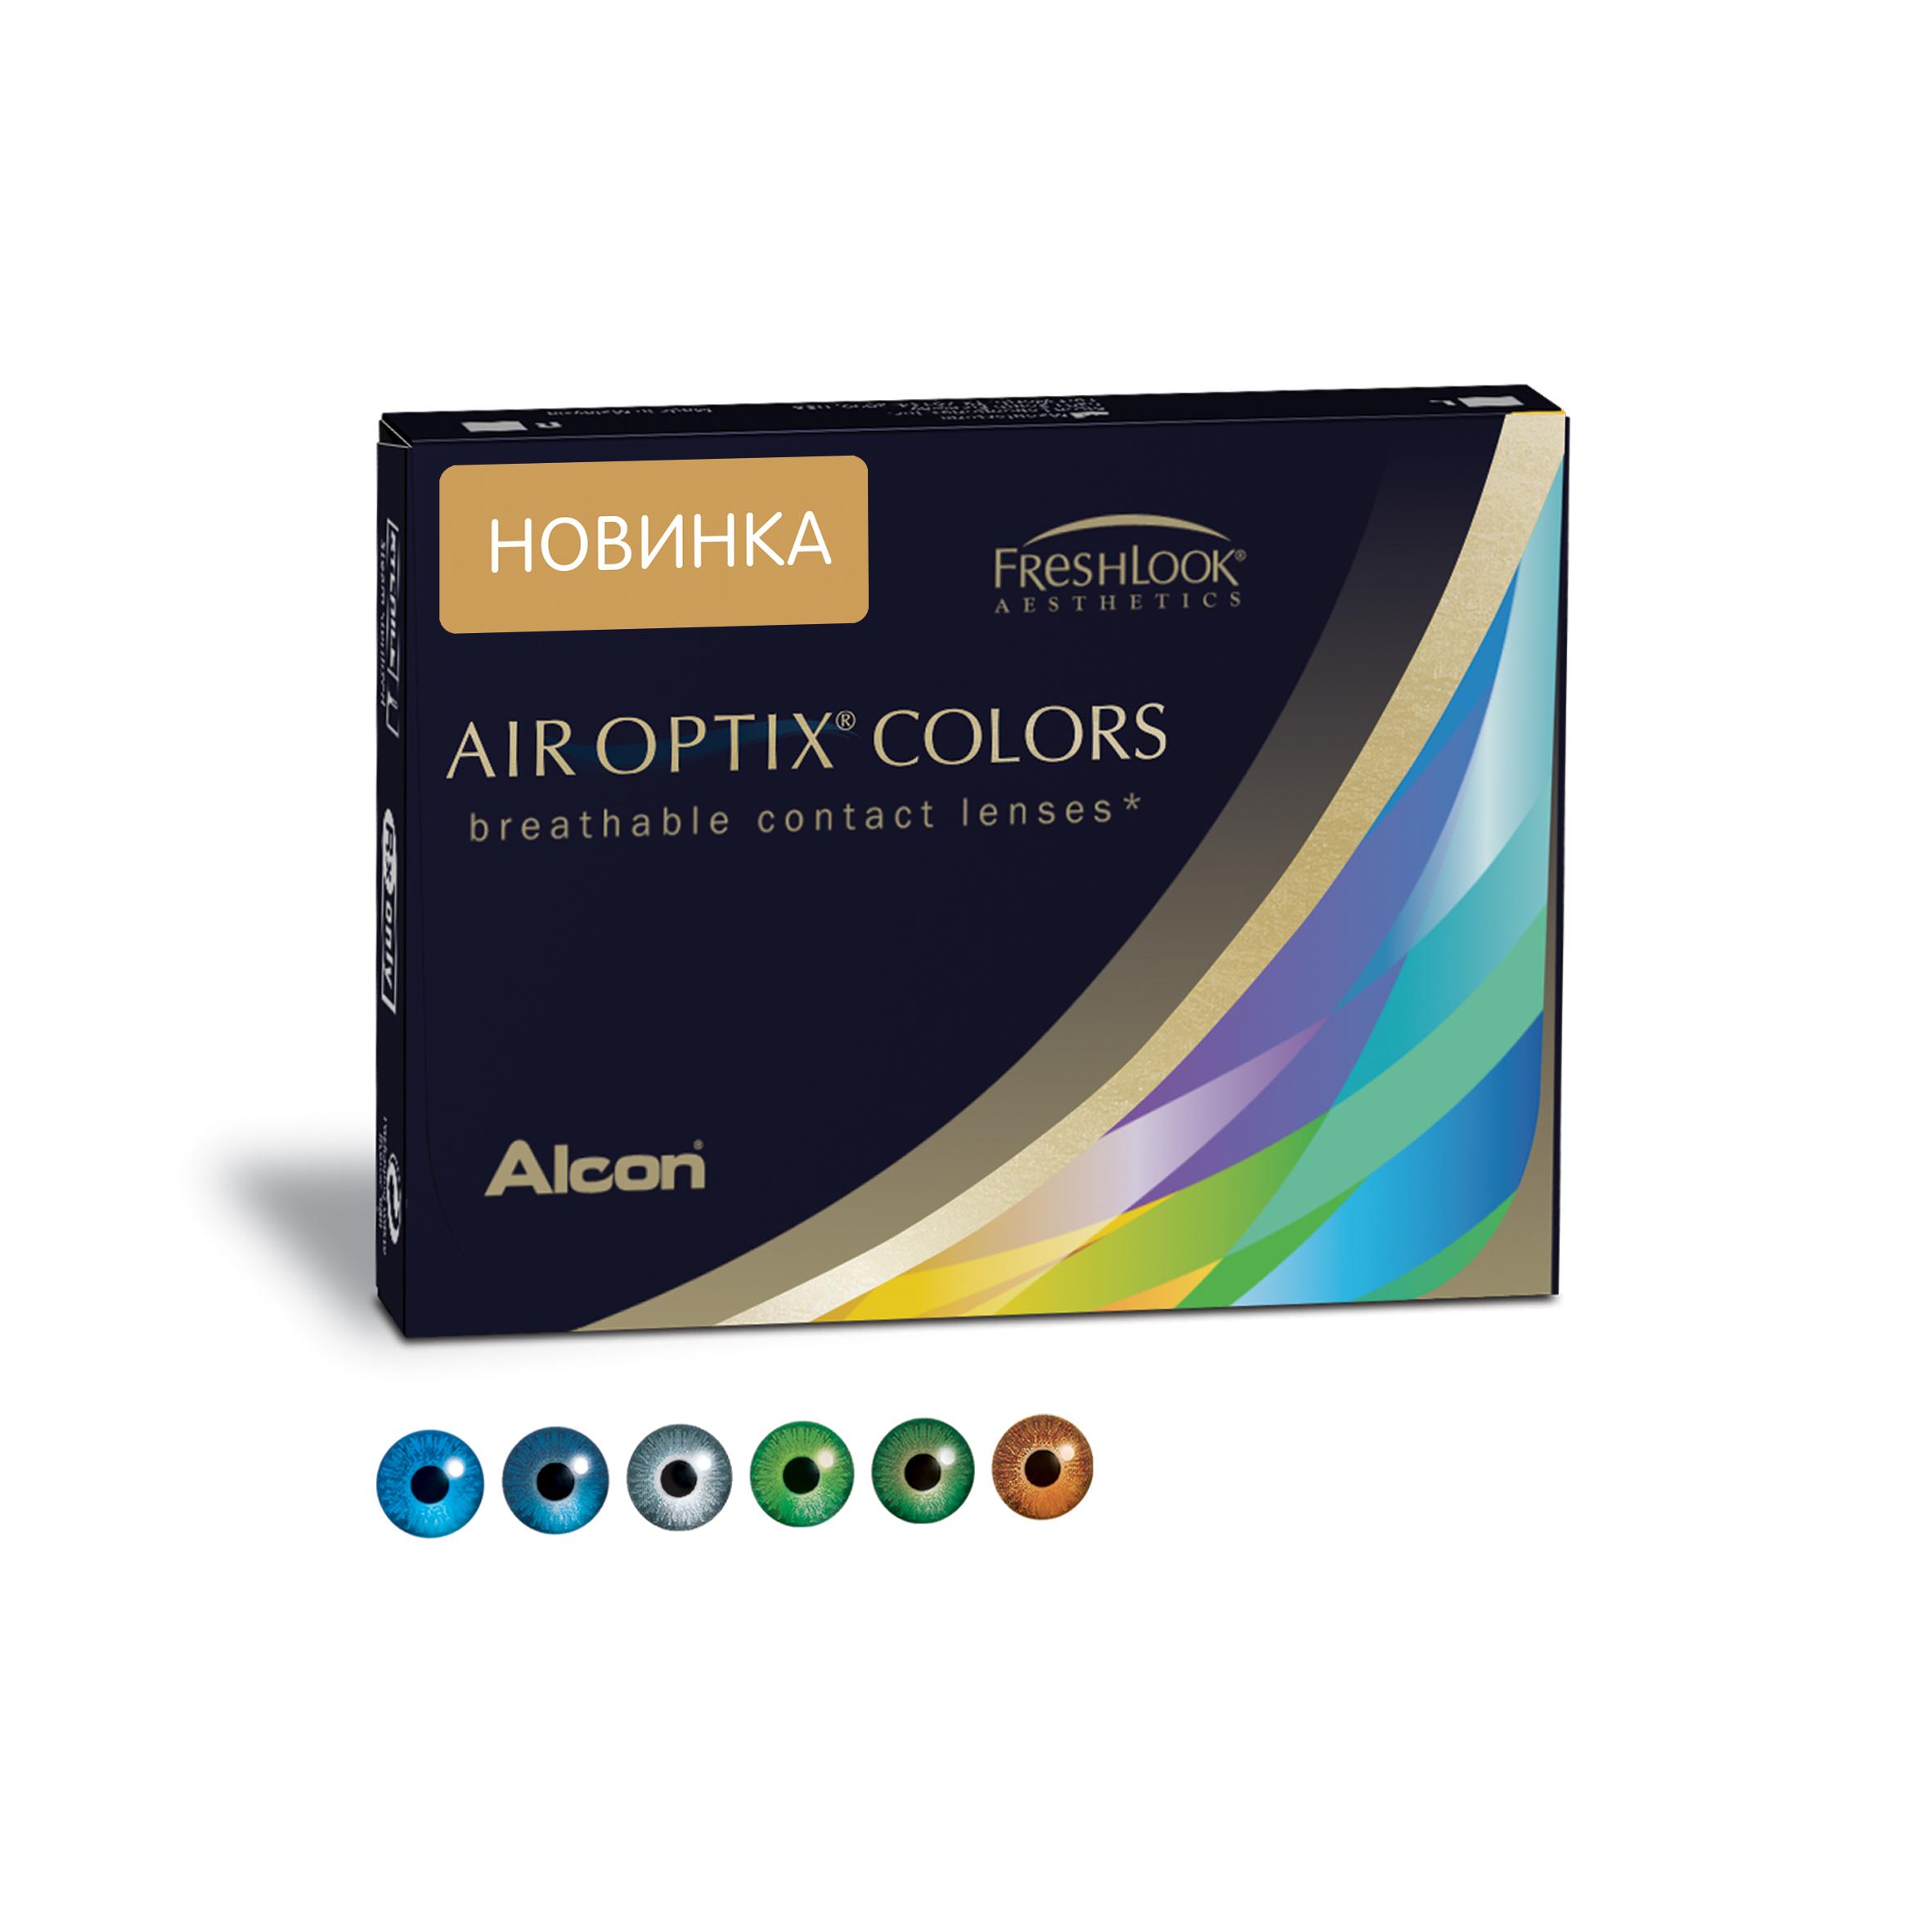 Аlcon контактные линзы Air Optix Colors 2 шт -6.00 Gemstone Green31746304Мягкие контактные линзы